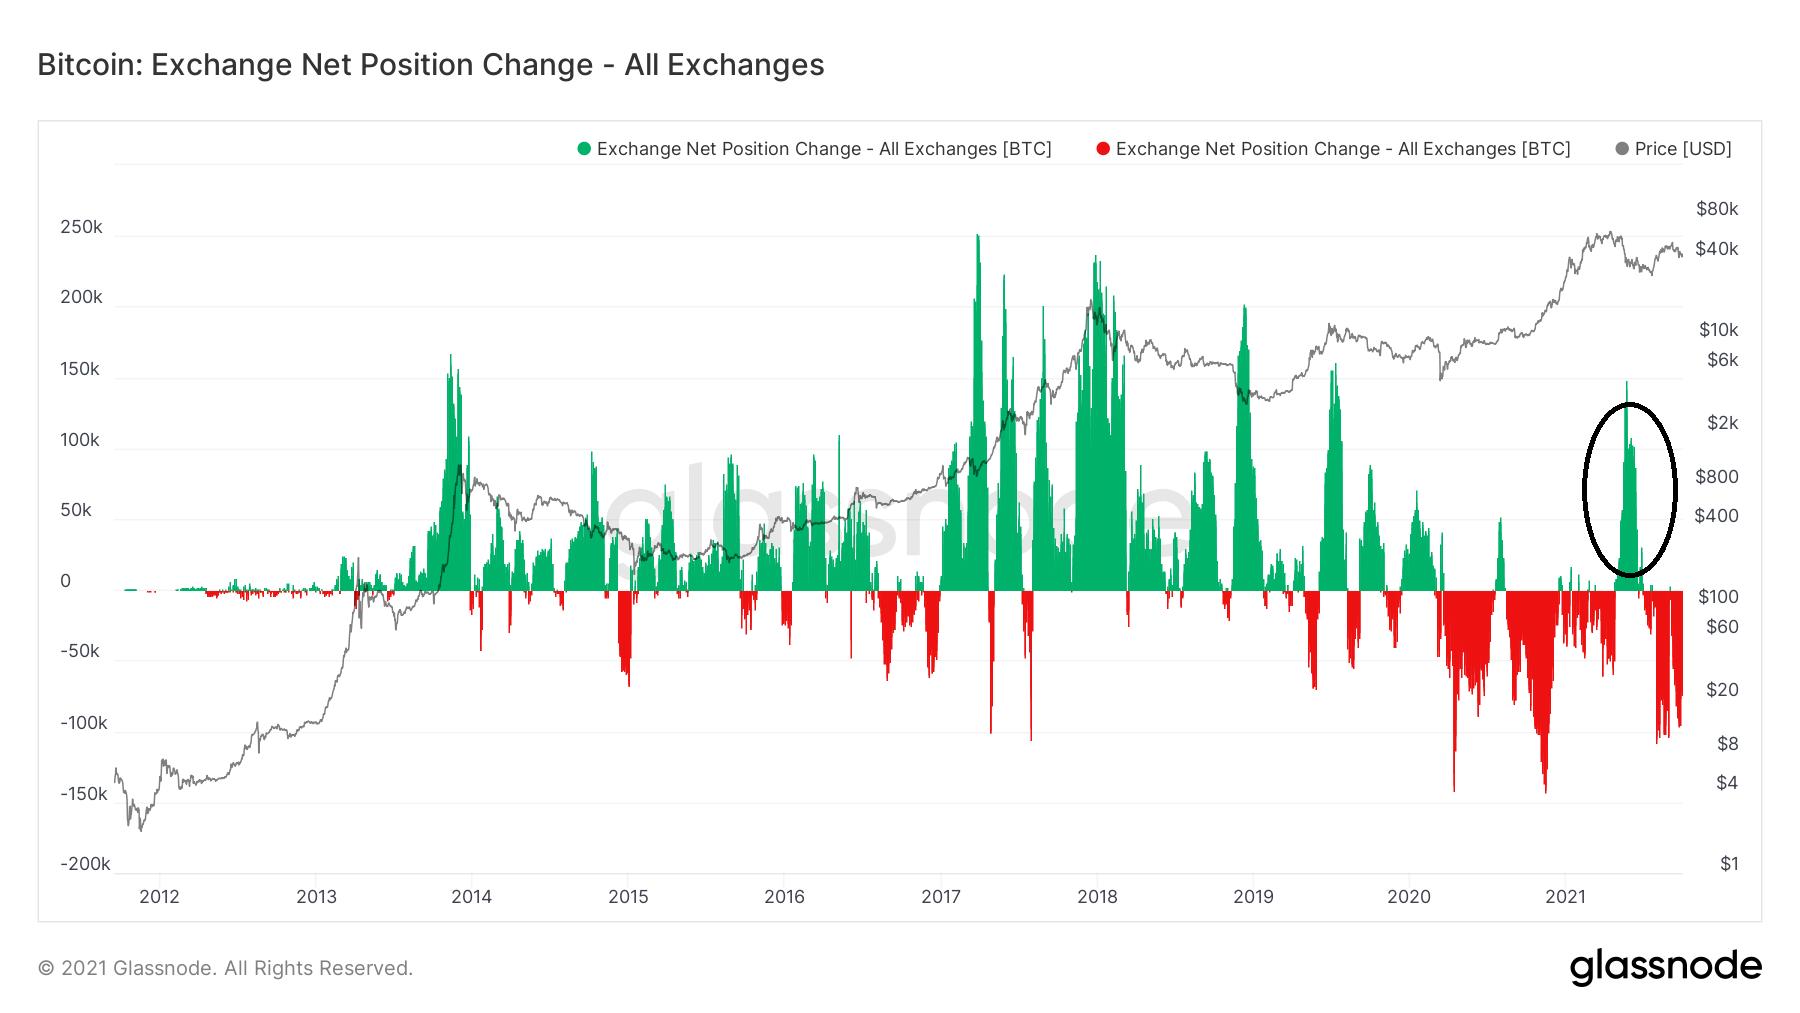 Exchange net position